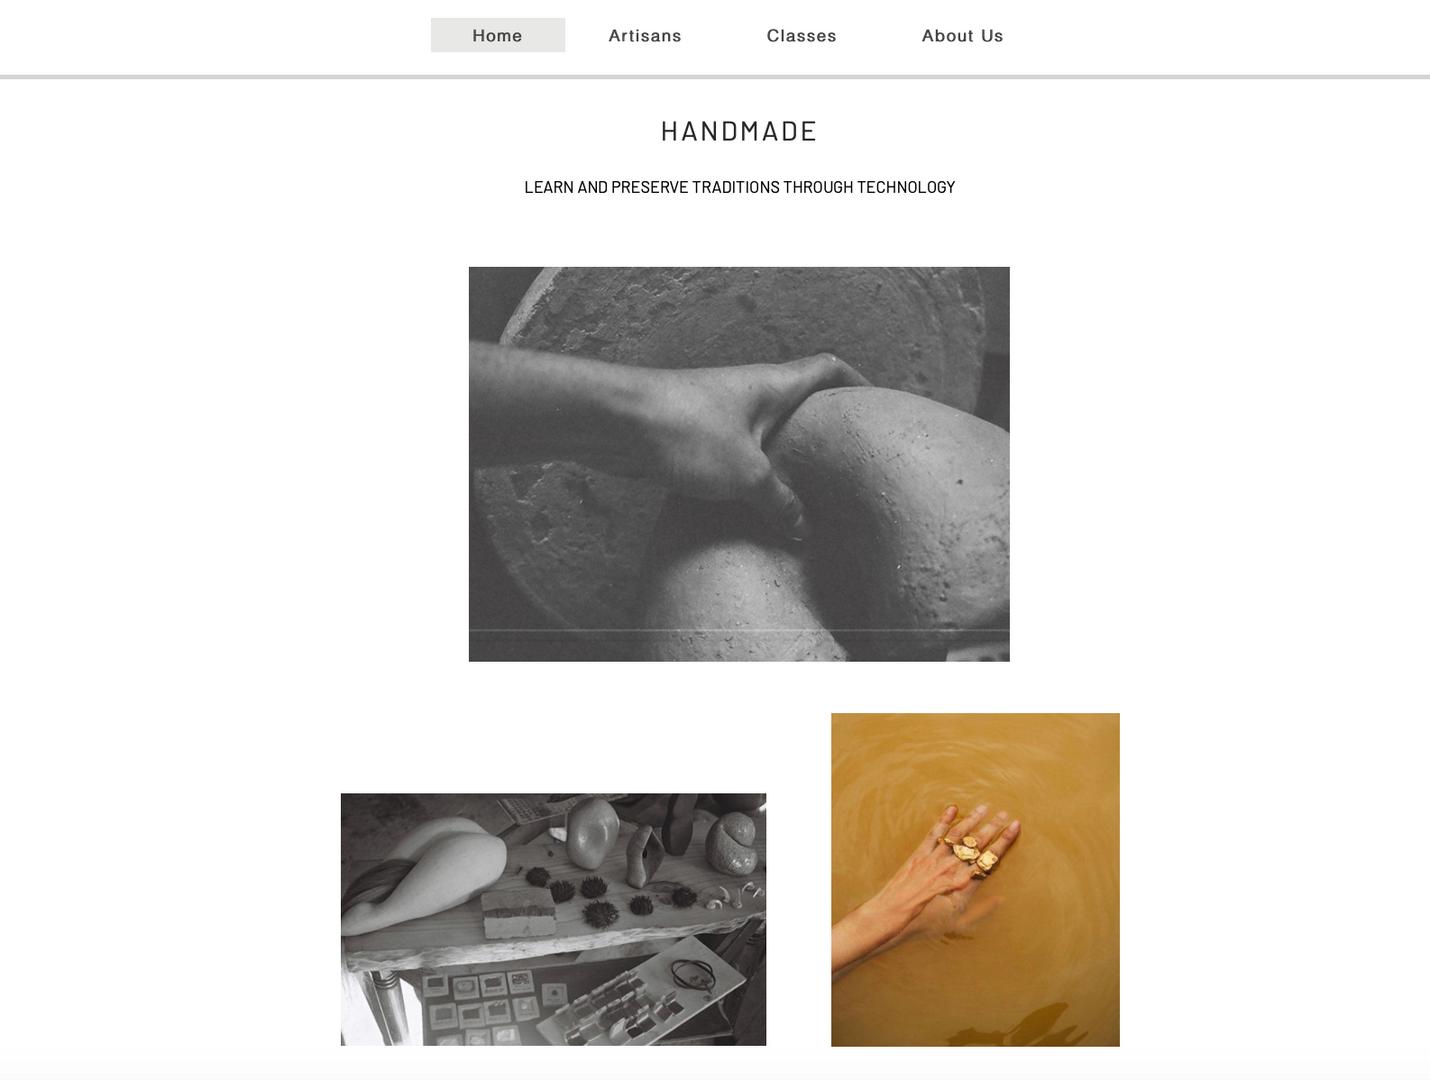 The homepage of handmade, a skill share platform for everyone